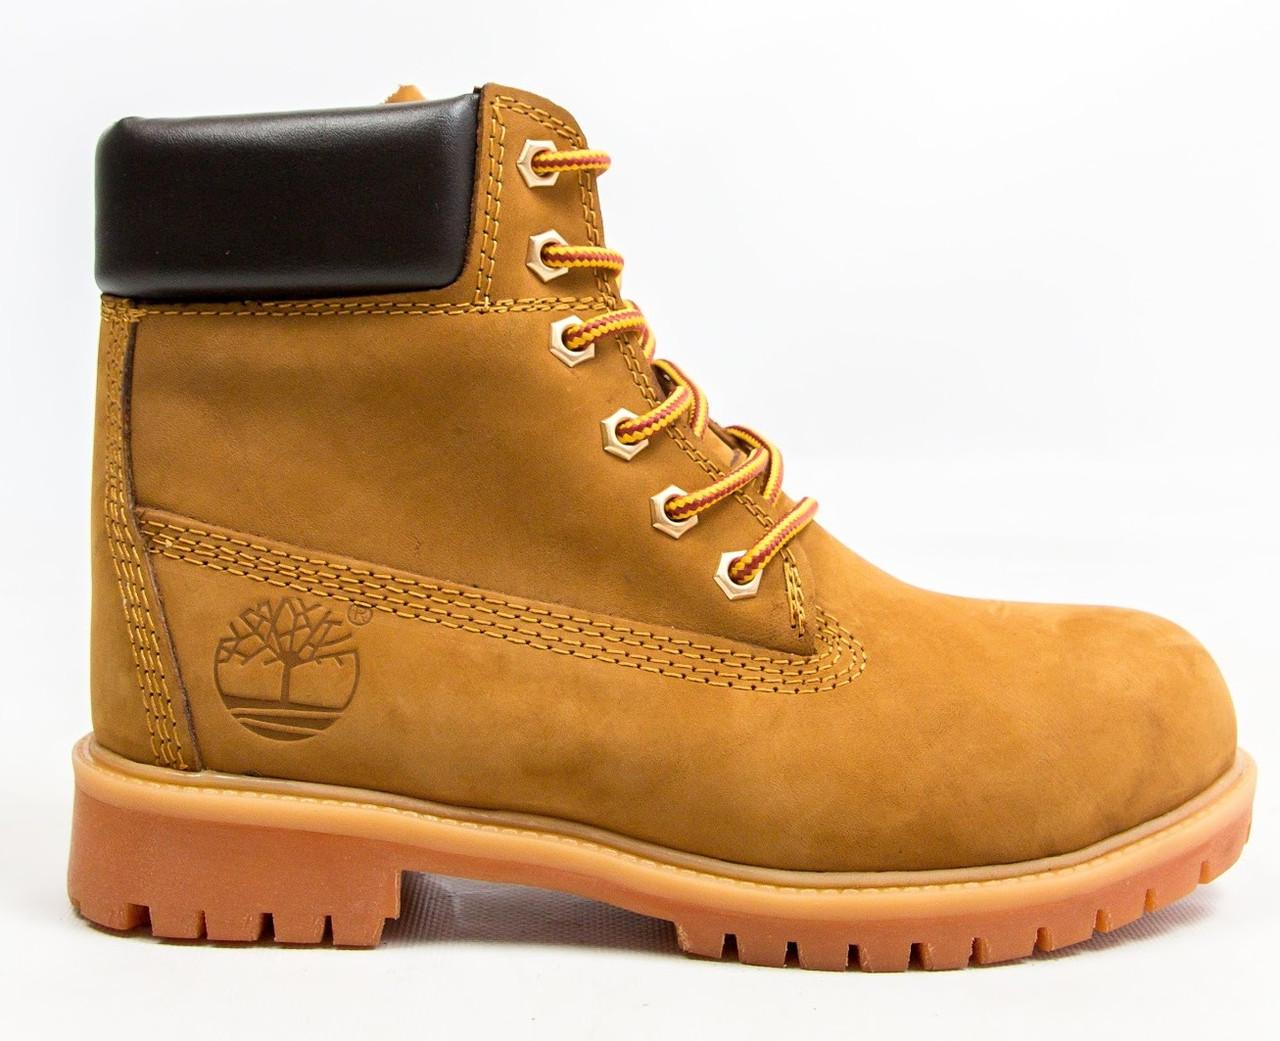 94e39cb2 Зимние мужские ботинки Timberland classic 6 inch yellow без меха (Реплика  ААА+) -